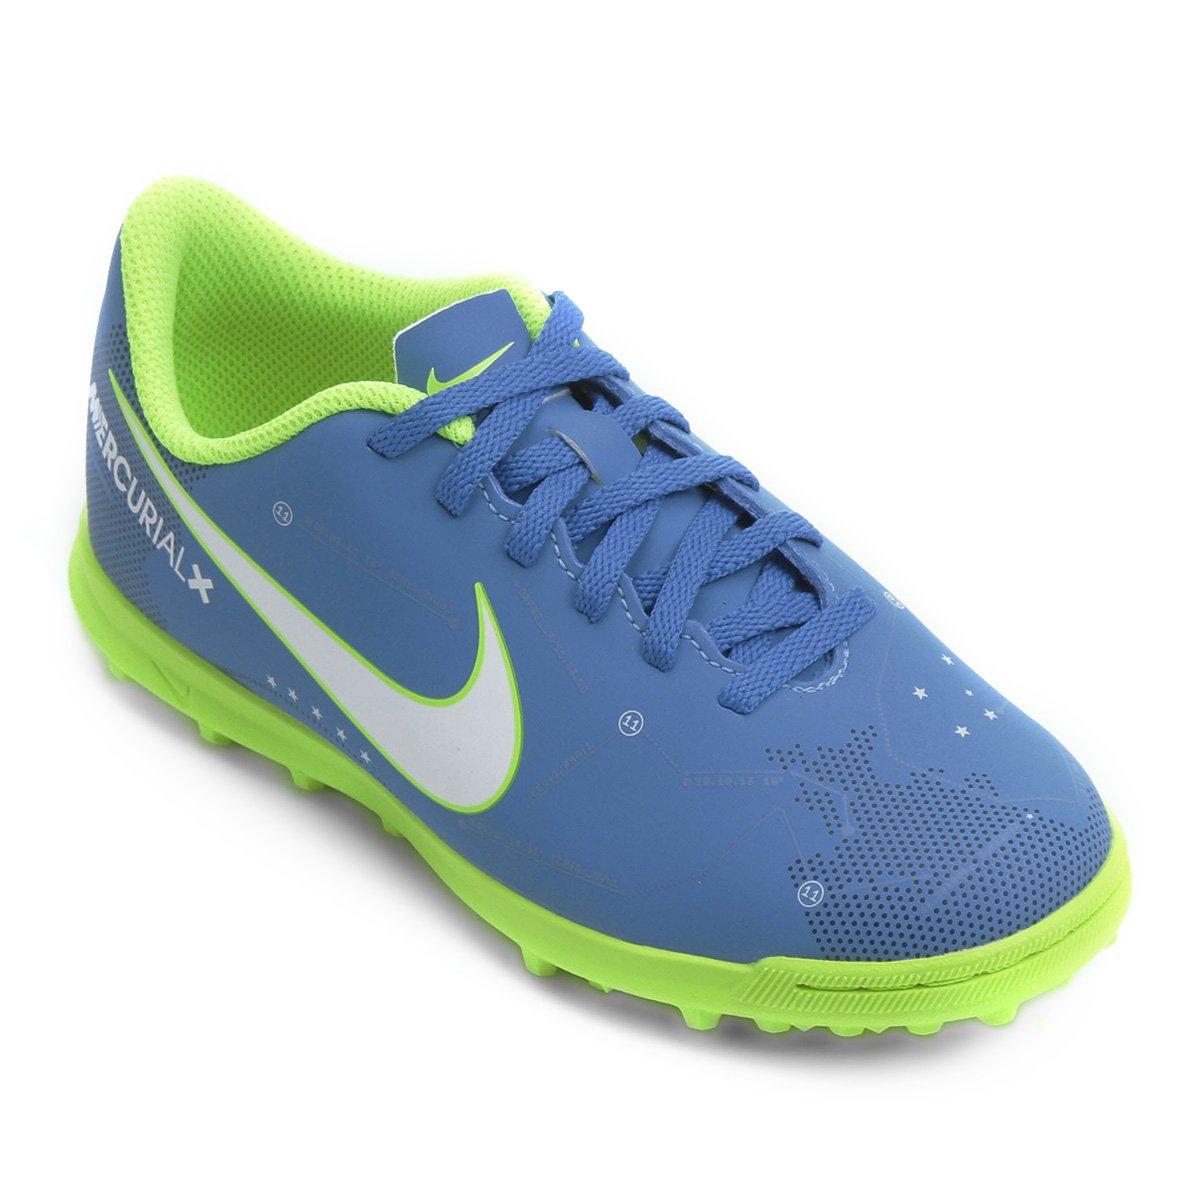 dcbdcfdd96 Chuteira Society Infantil Nike Mercurial Vortex 3 Neymar Jr TF ...